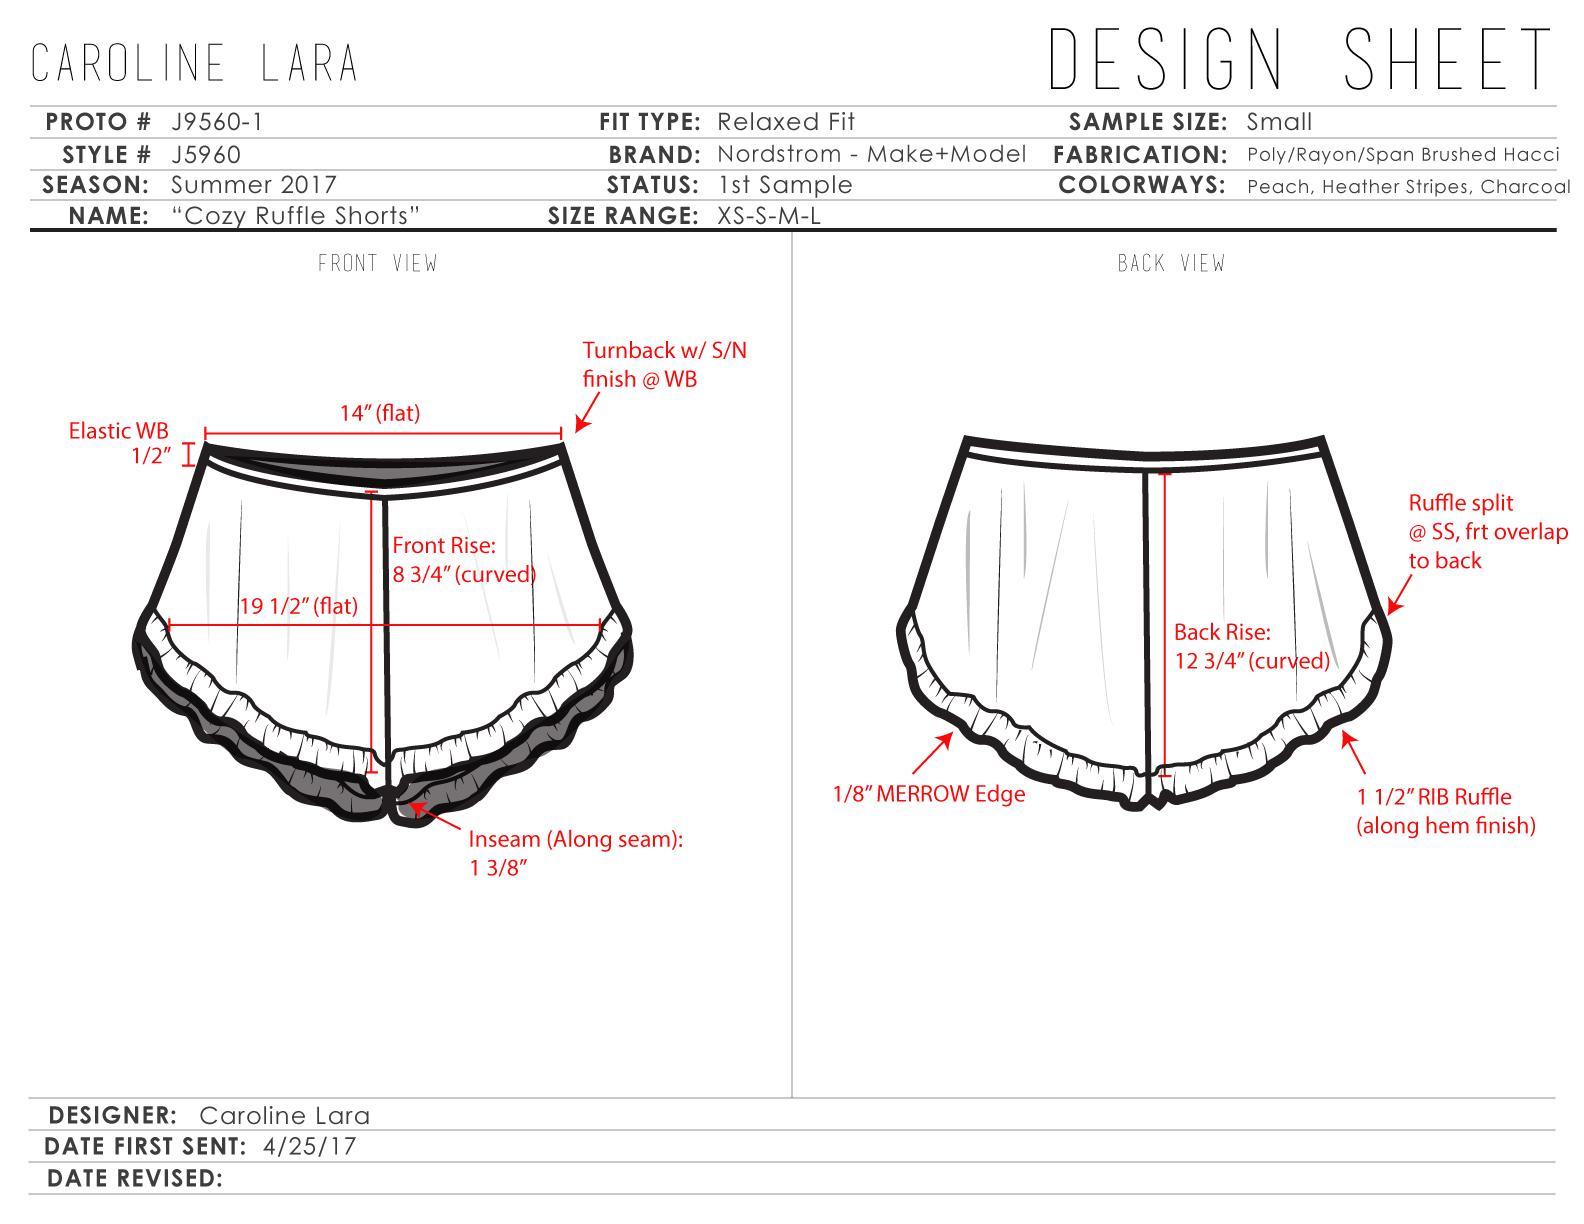 Caroline-Lara-Technical-Sketch-sample-2-1.jpg